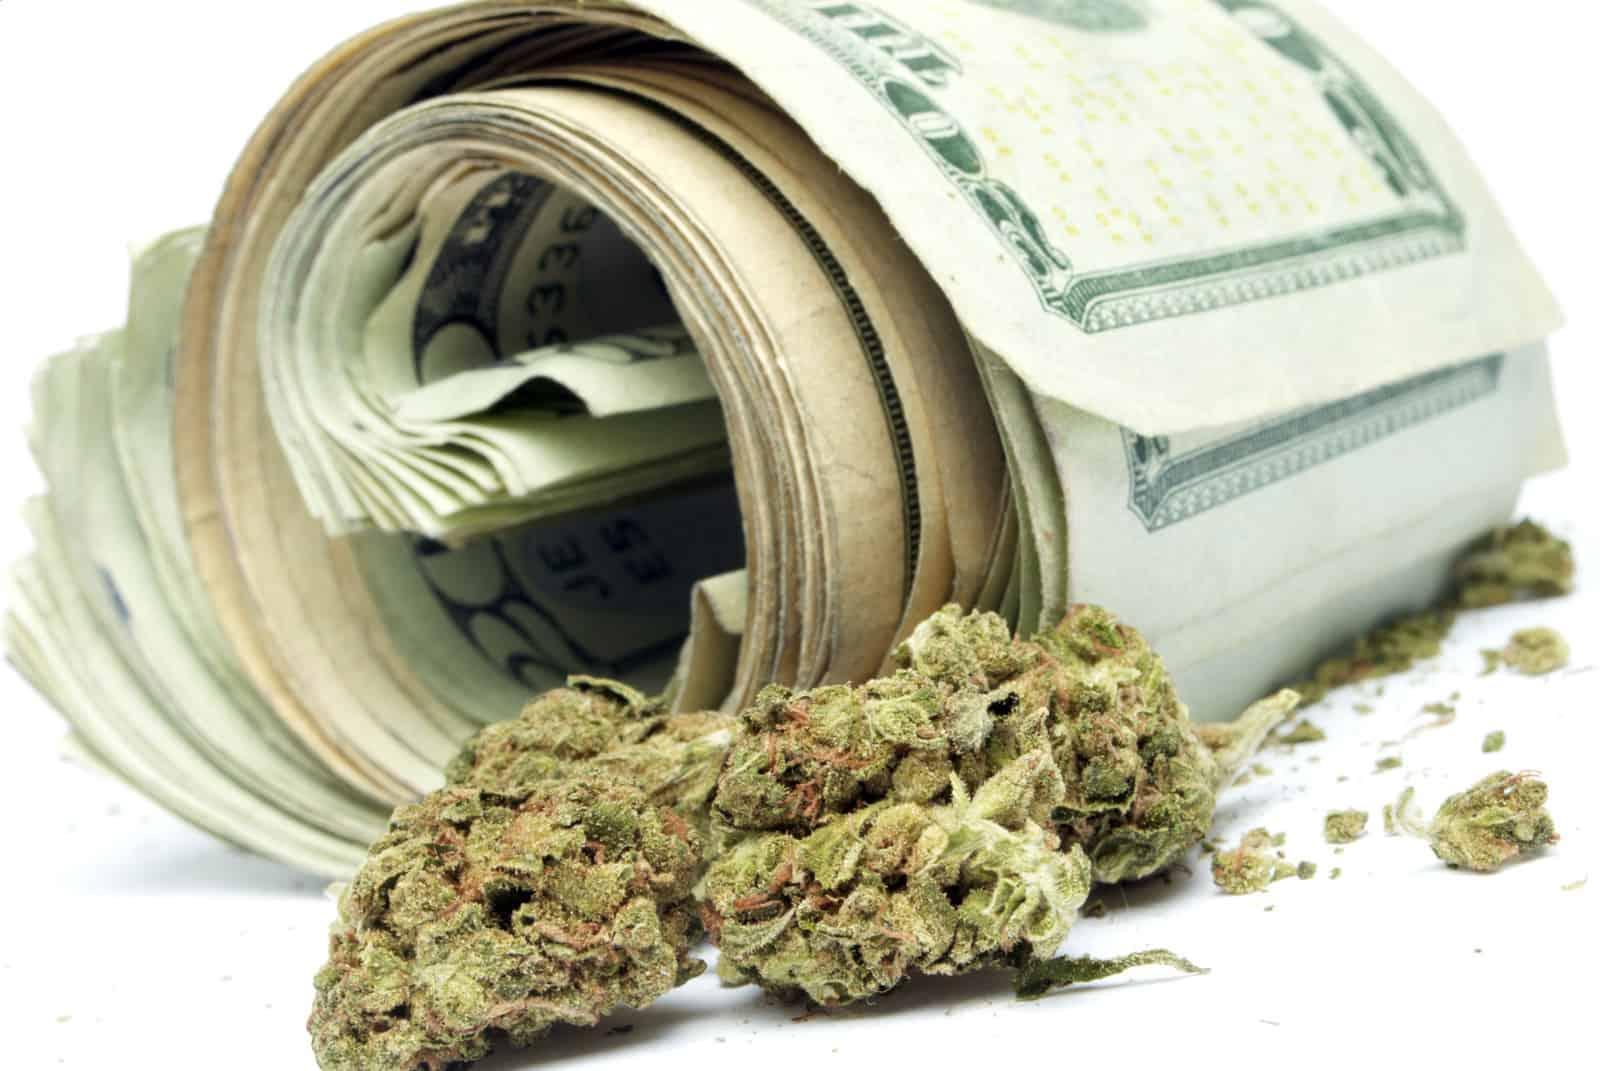 Aurora, Colorado Is Helping Homeless Residents With Its Marijuana Tax Revenue